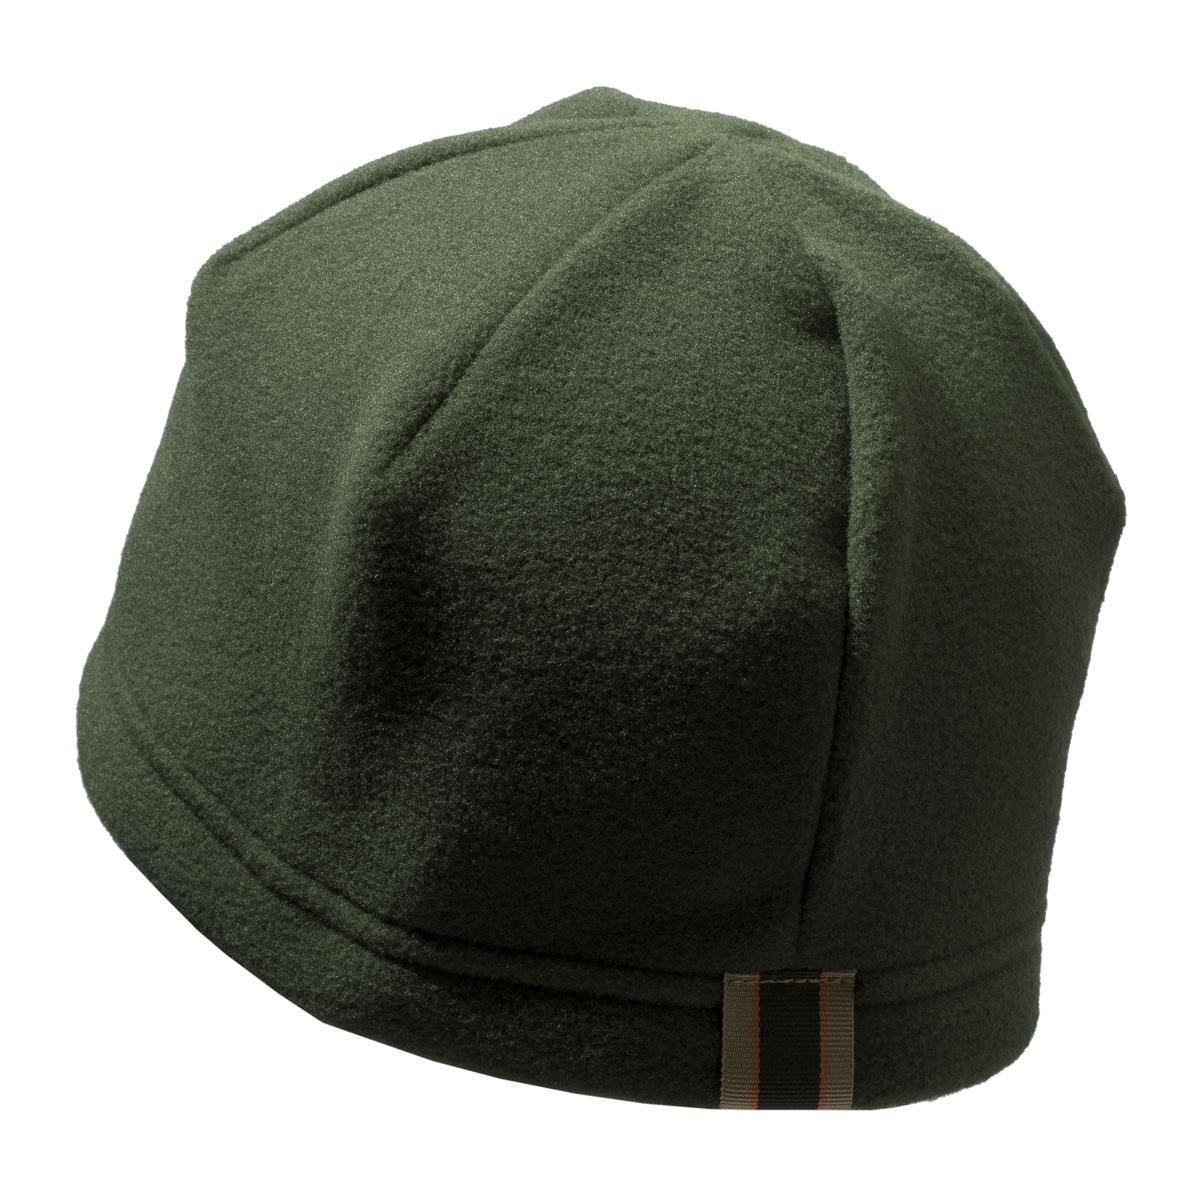 ... Image of Beretta Fleece Beanie - Green. « 5a4e5a2e1b1b